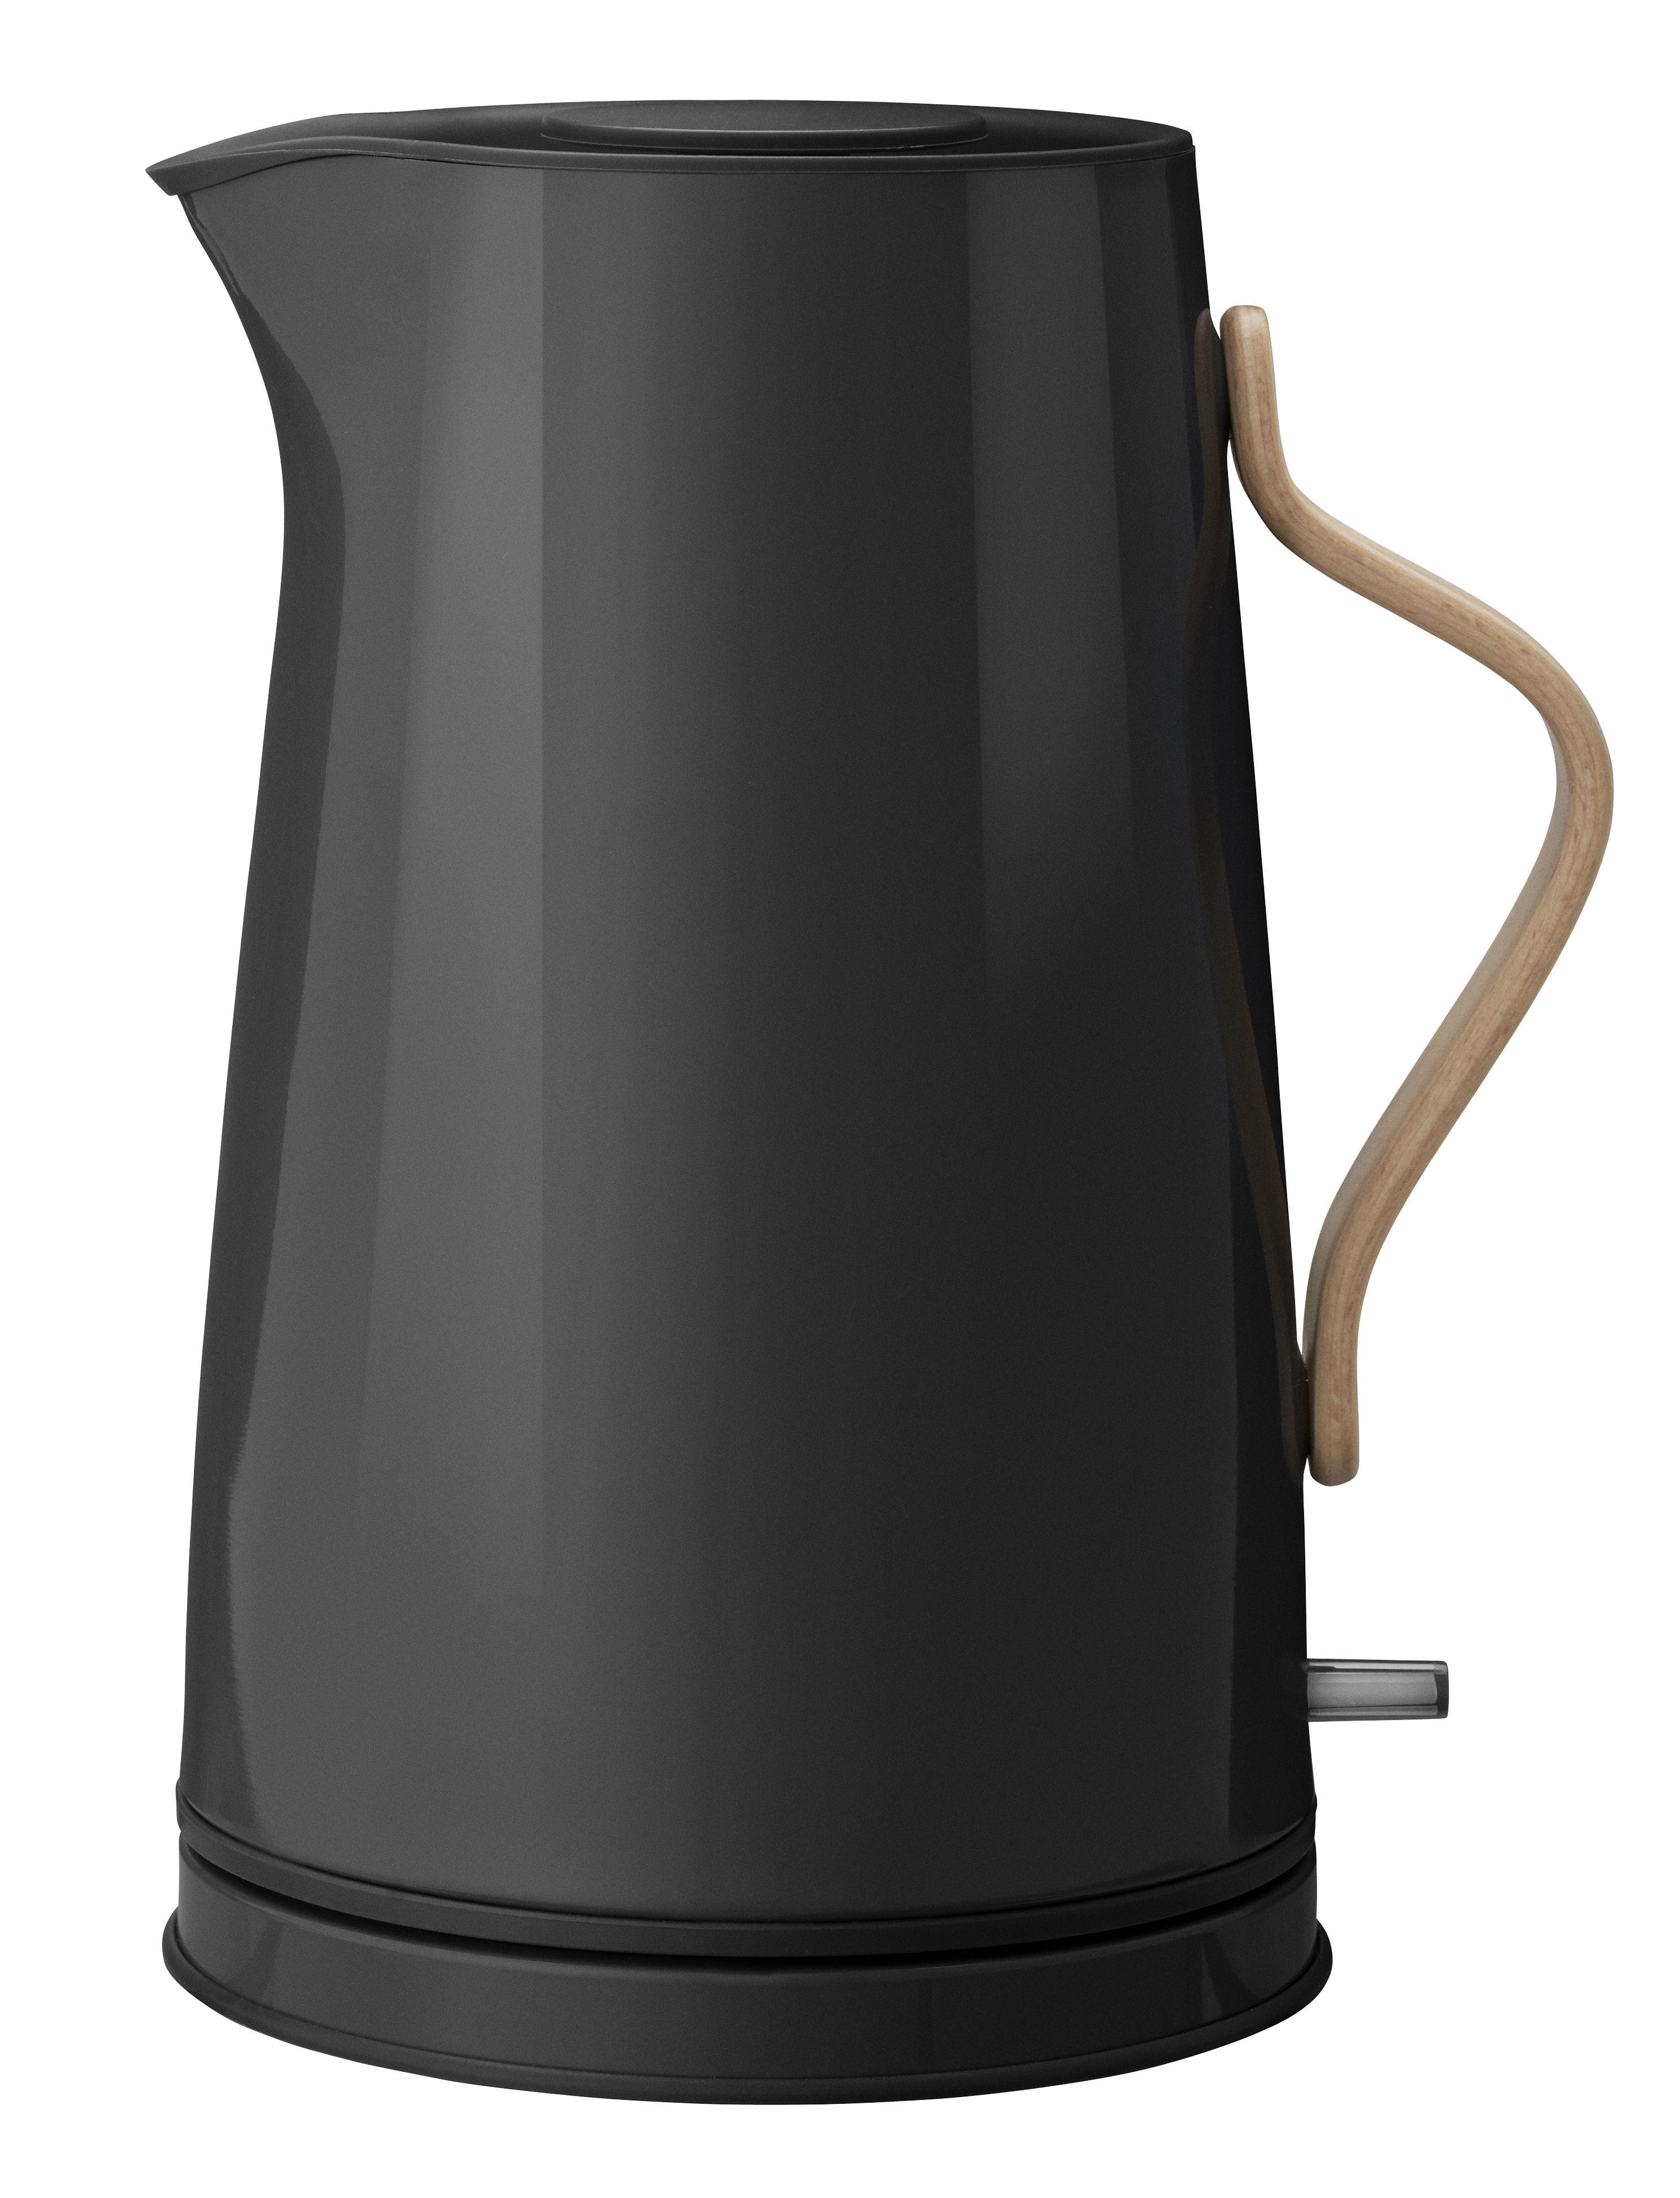 emma 1 2 l holz metall stelton wasserkocher. Black Bedroom Furniture Sets. Home Design Ideas